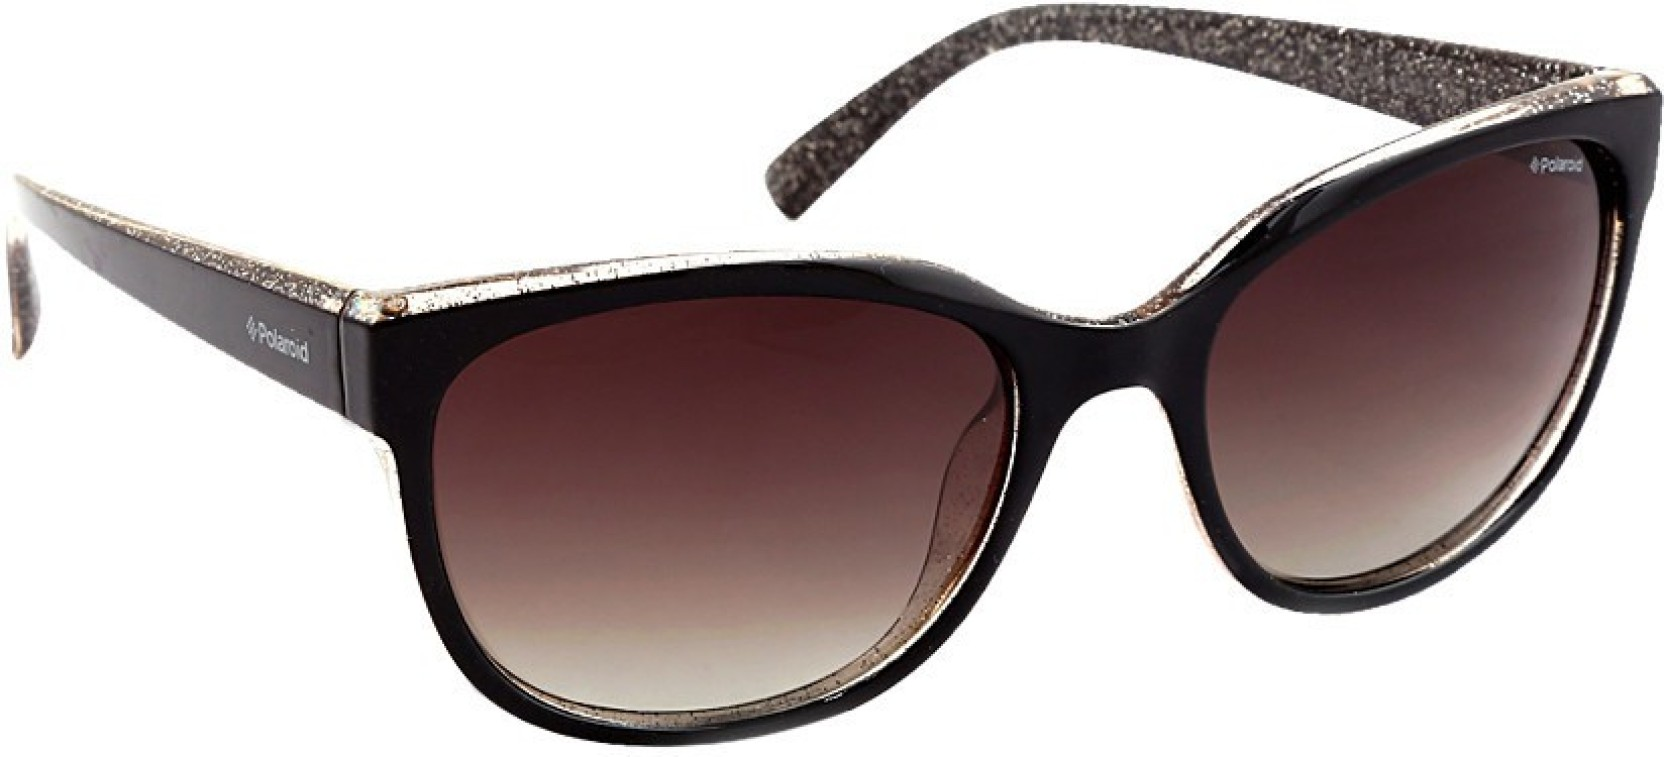 f18fa139d28 Buy Polaroid Cat-eye Sunglasses Brown For Women Online   Best Prices ...